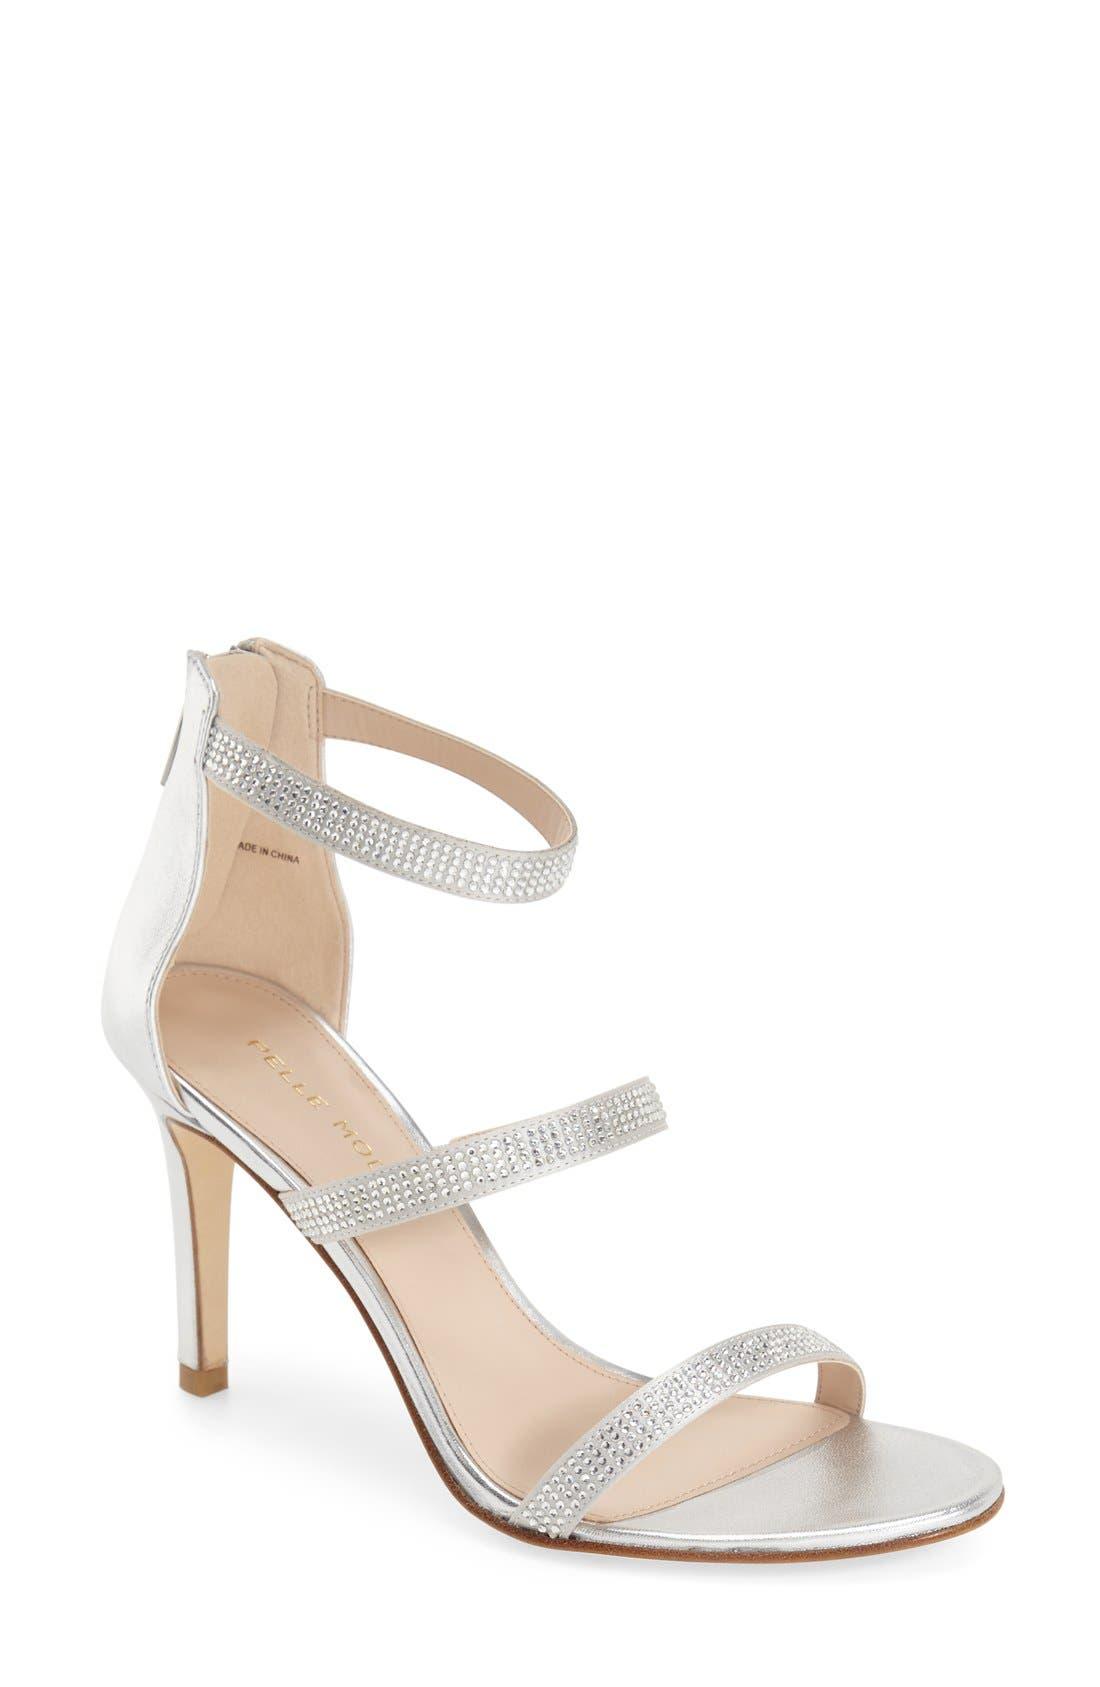 Alternate Image 1 Selected - Pelle Moda 'Dalia' Three Strap Sandal (Women)